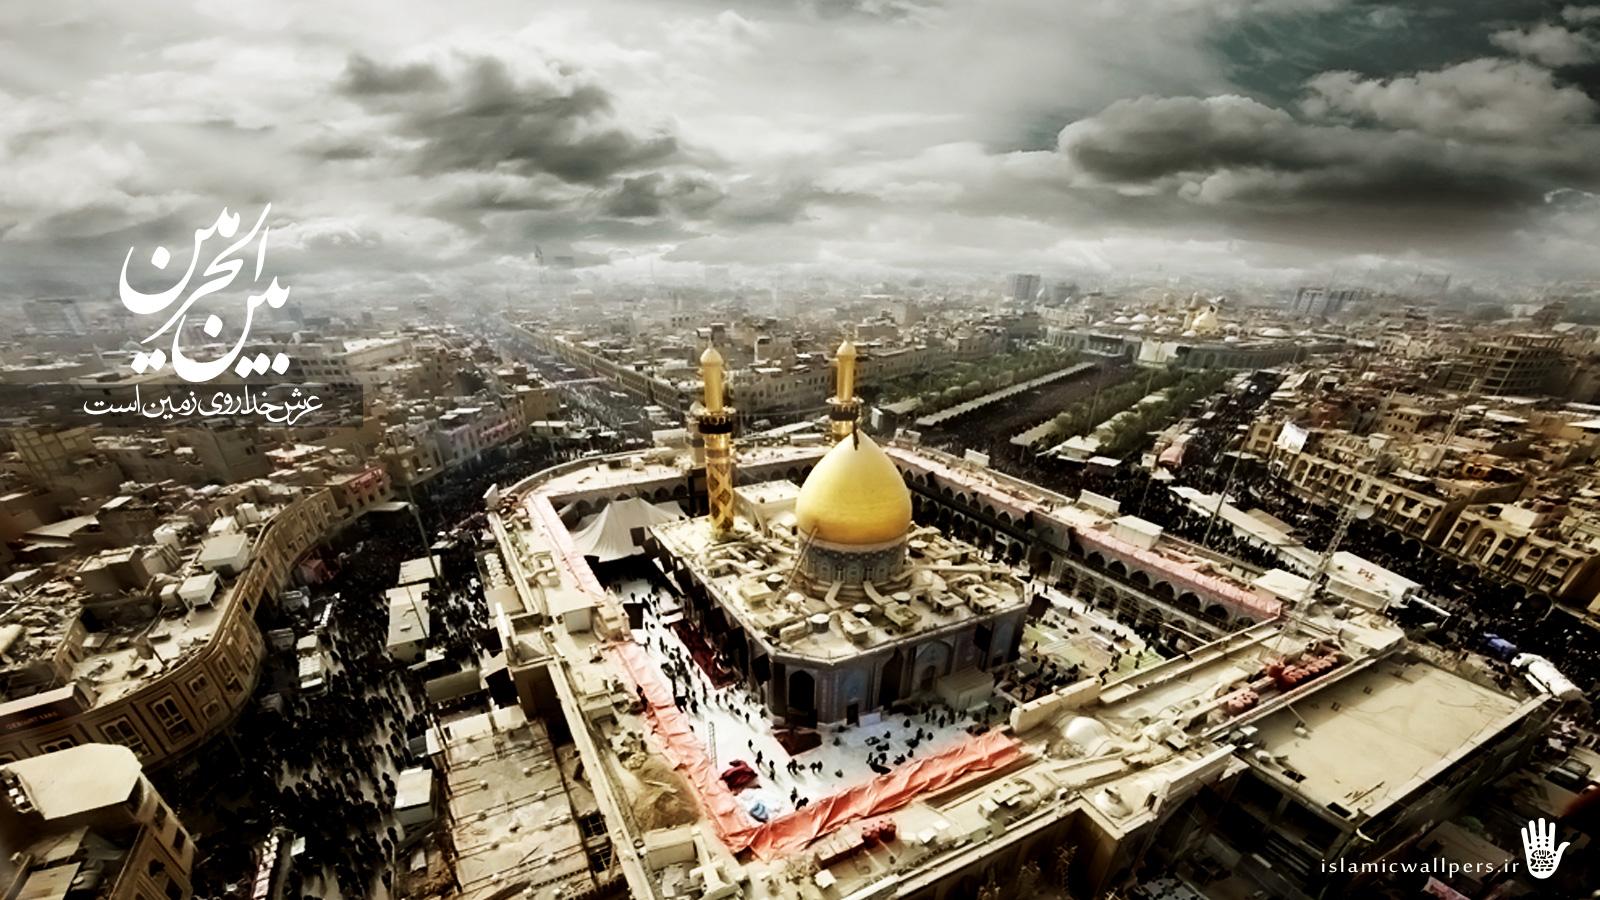 Karbala: Heart of Shia Muslims